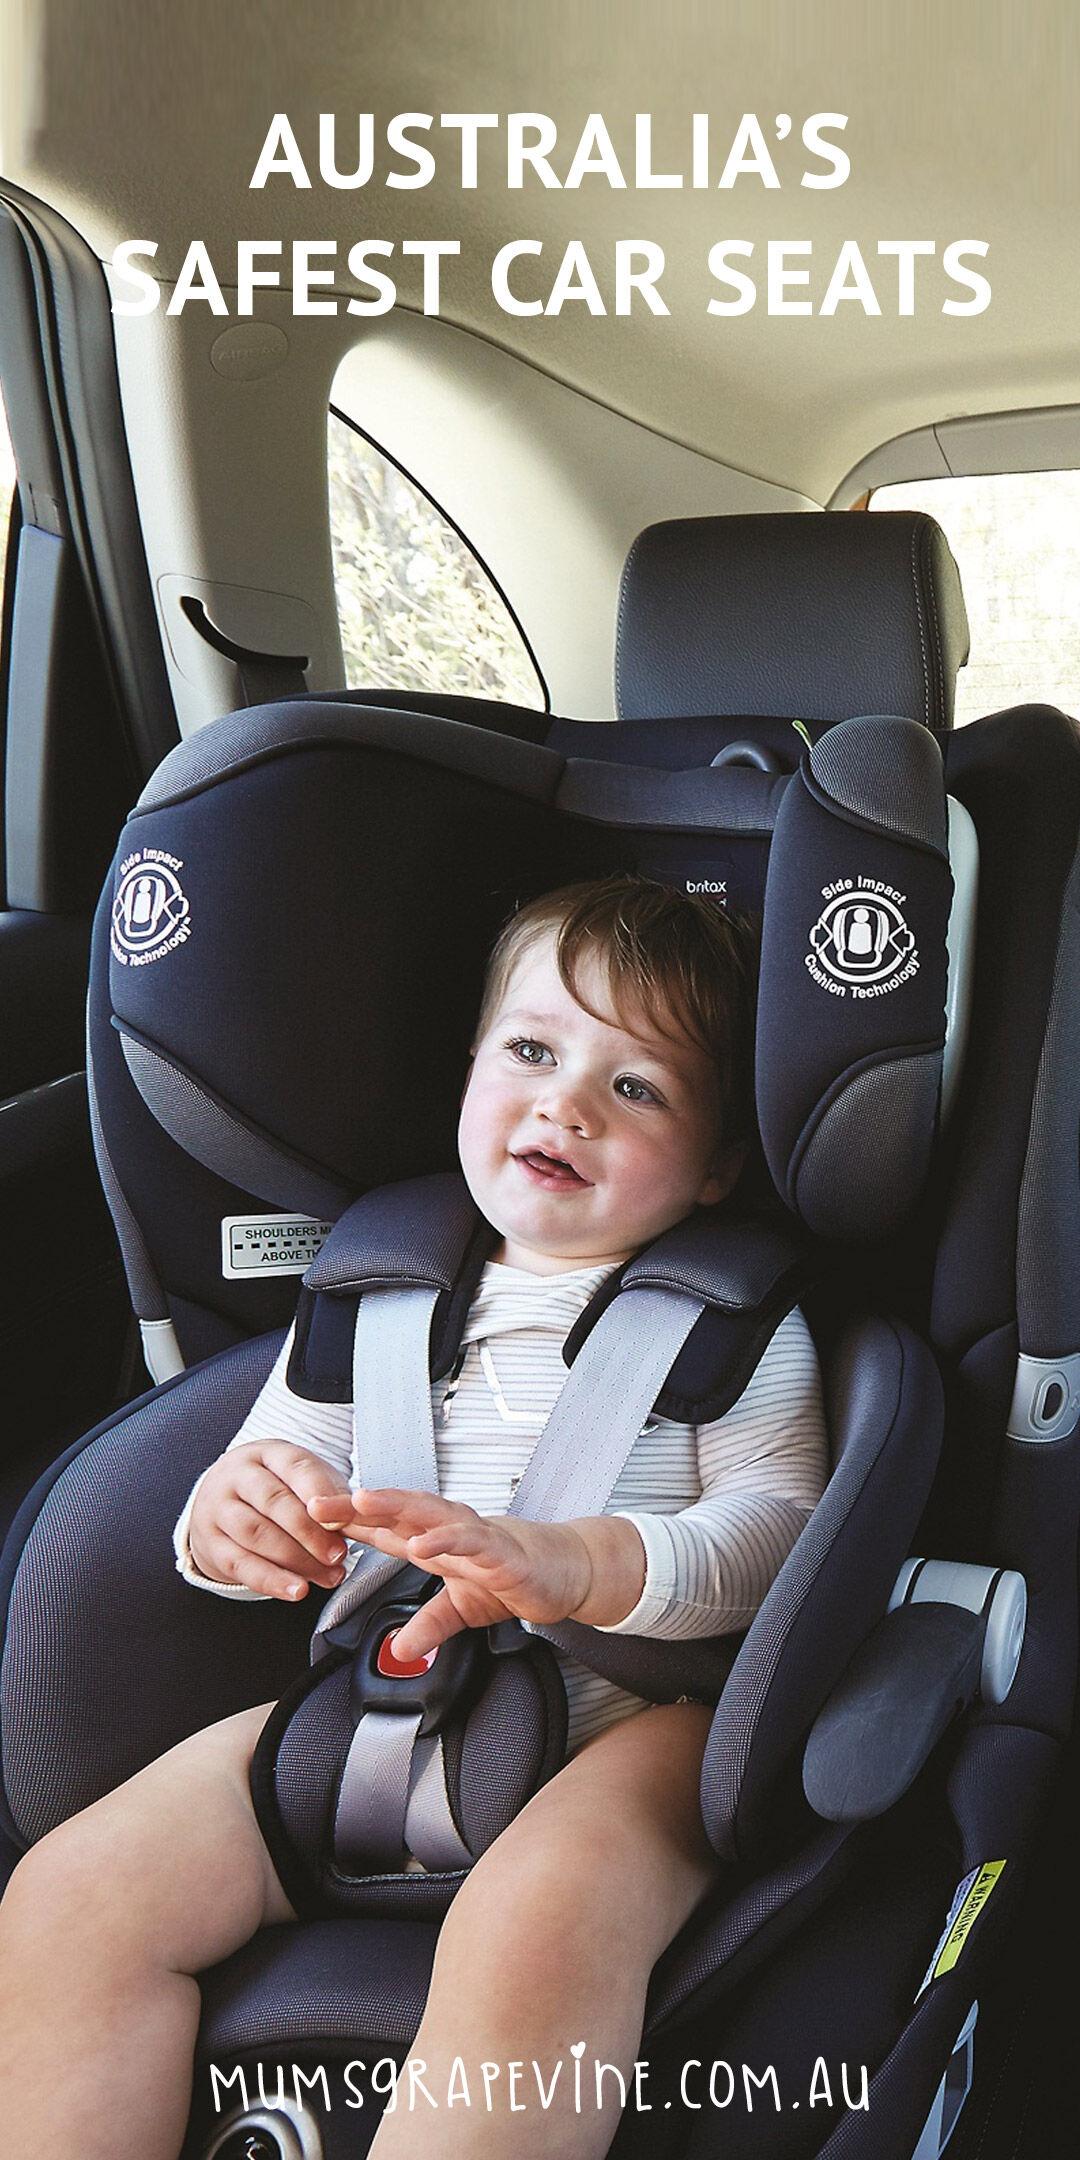 Australia's Safest Car Seats PIN